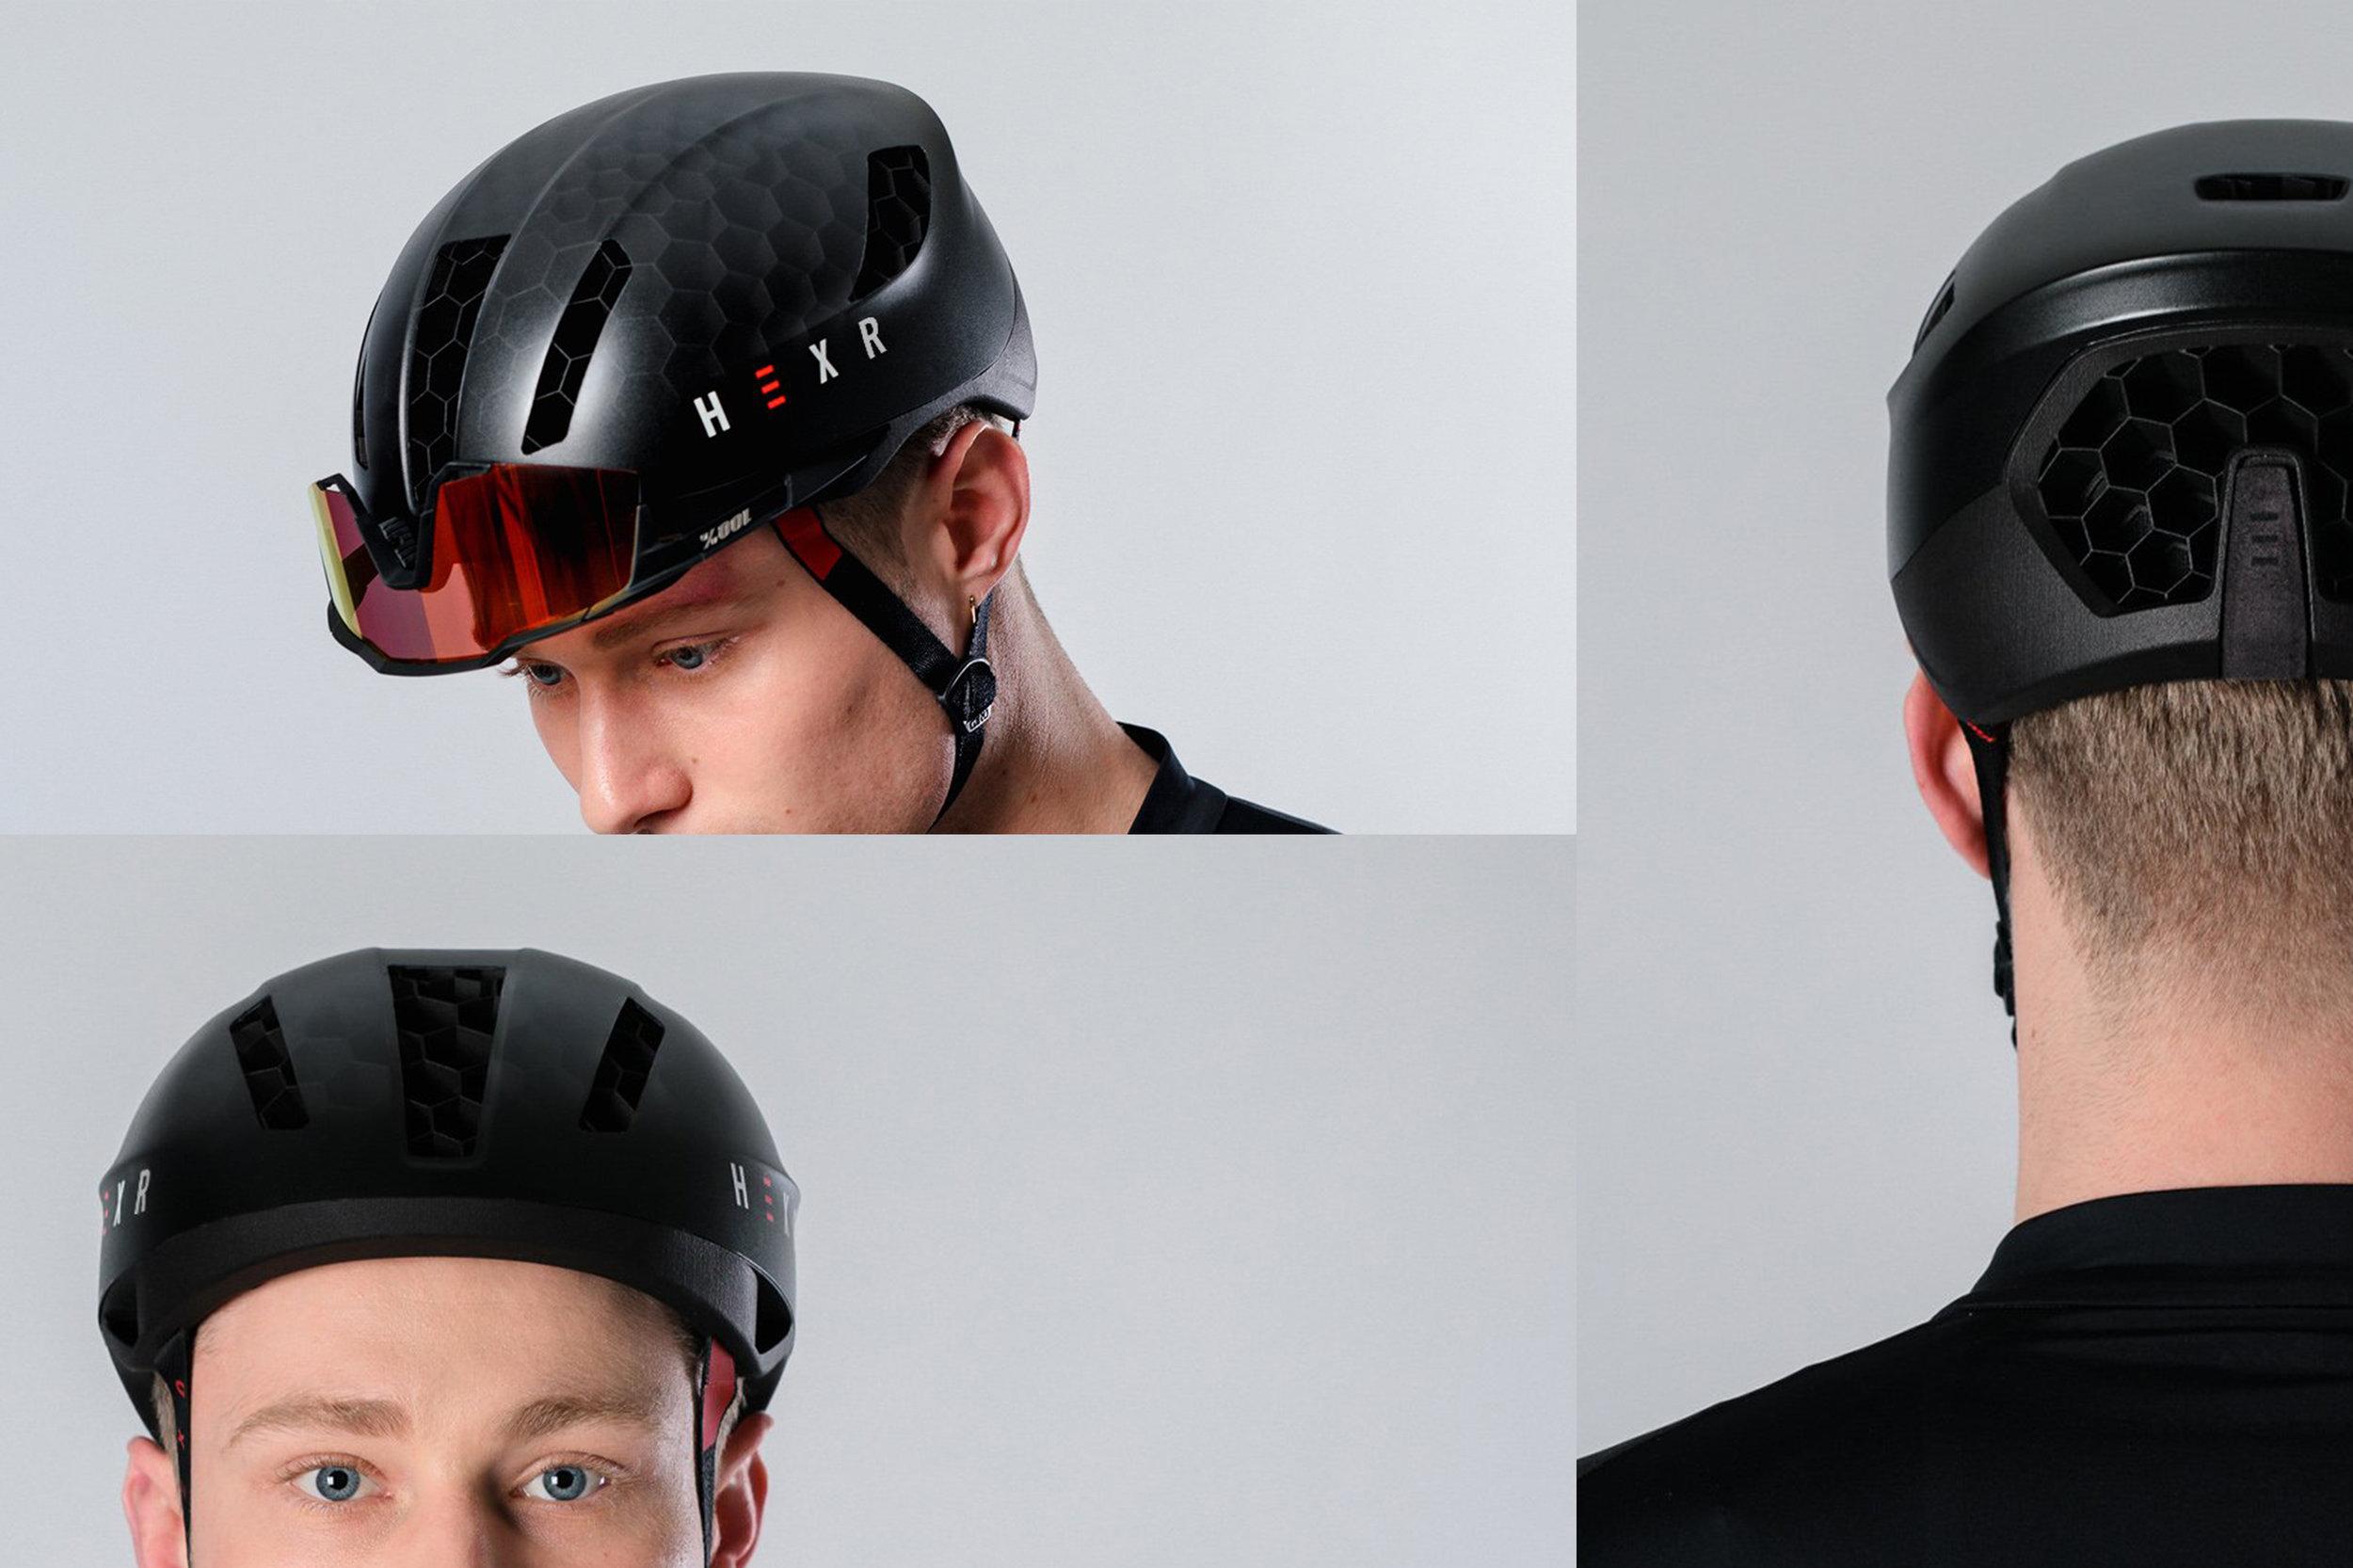 Hexr - helmet - photography - black - curventa - 3D printed - glasses - headgear - straps - male - vents - ventilation - transparent - hex - views - back view - aerodynamic - details - front view